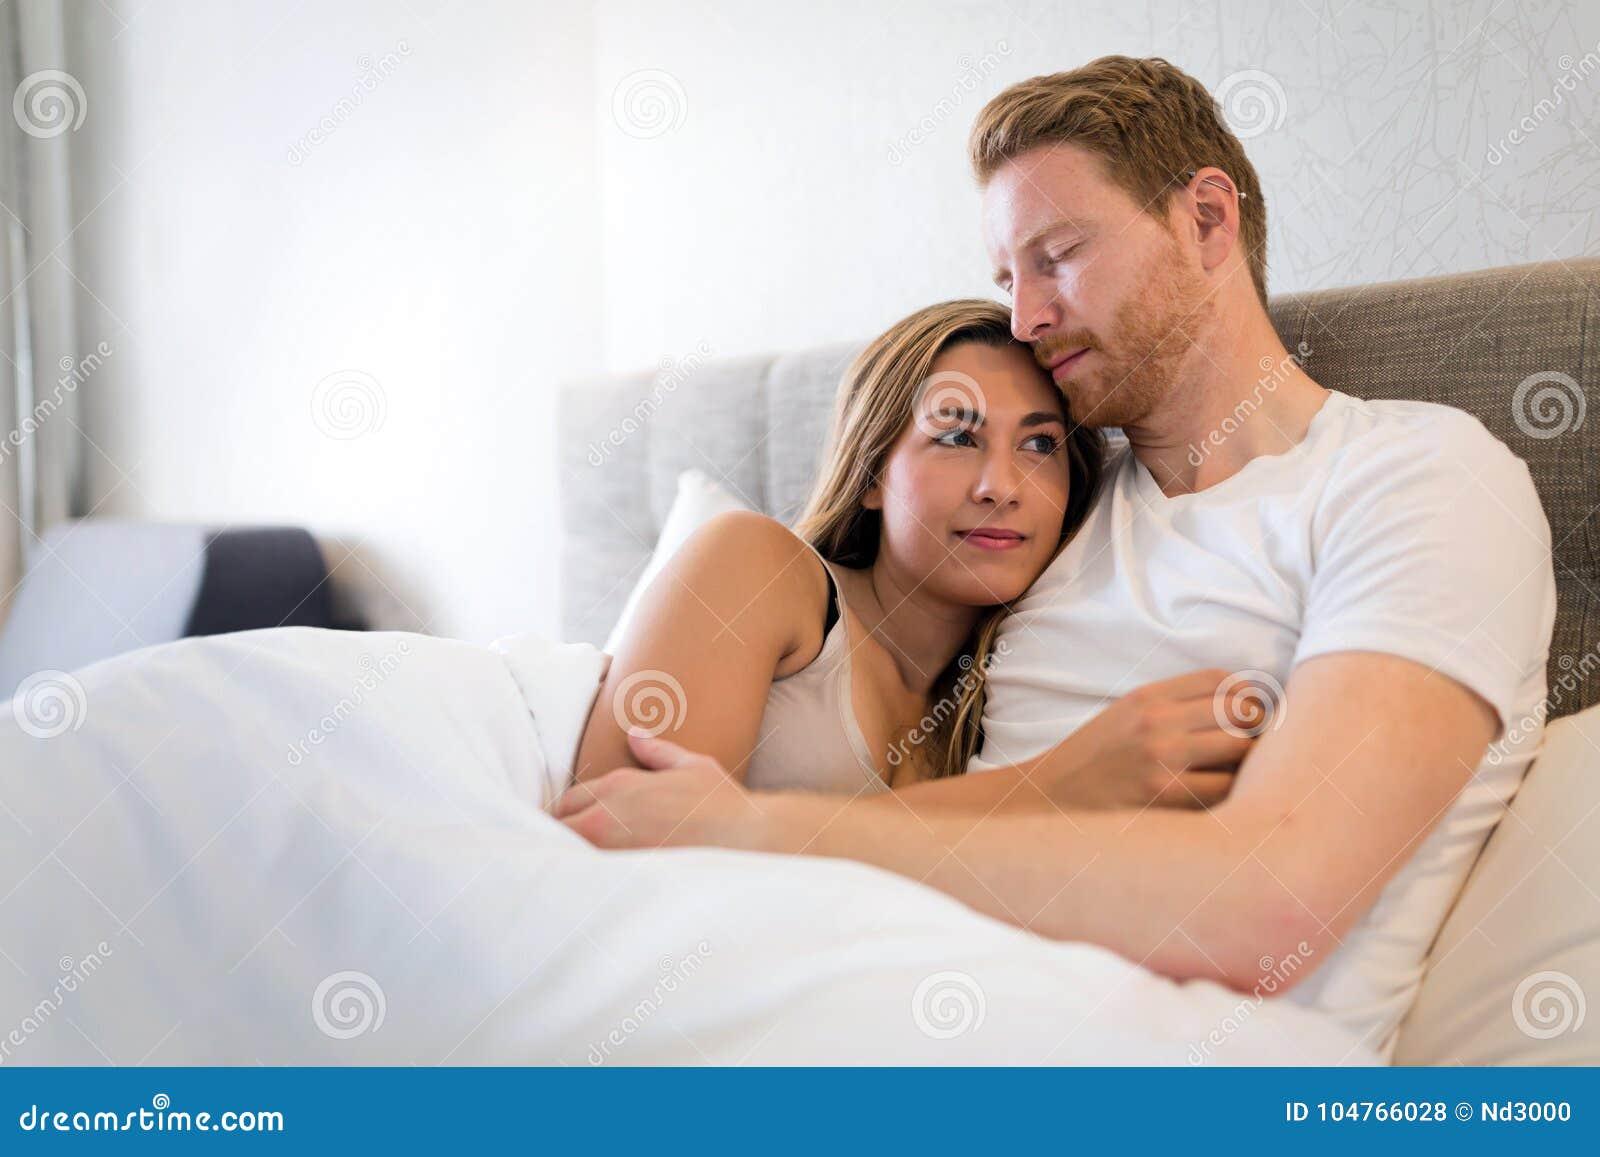 Girls boobs having sex